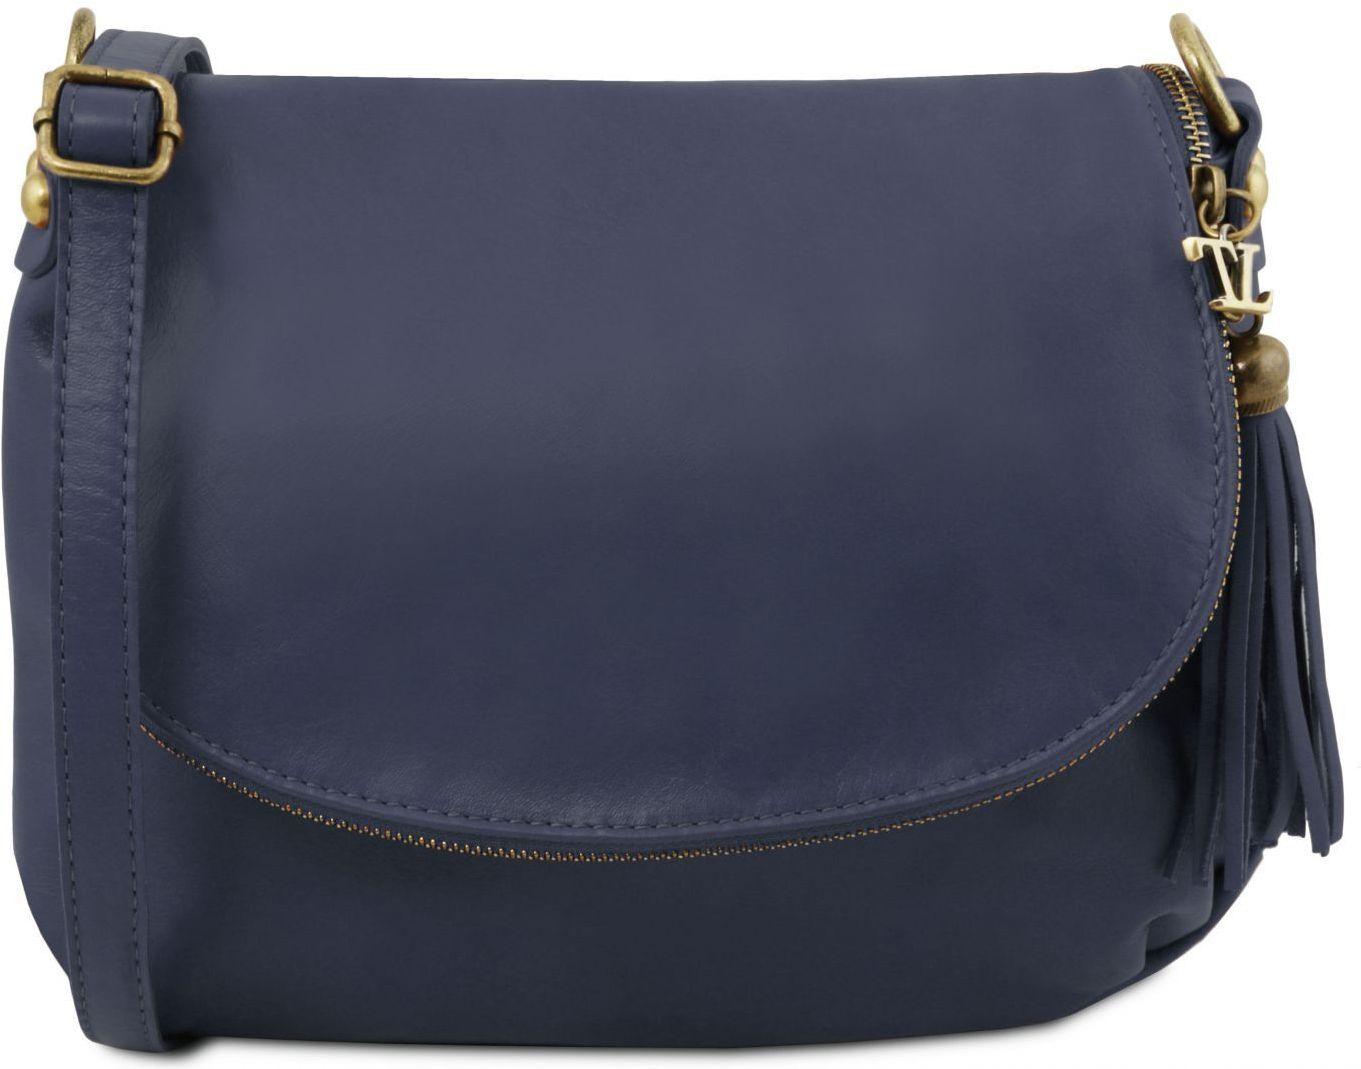 e21cb3255f Γυναικεία Τσάντα Δερμάτινη TL141223 Μπλε σκούρο Tuscany Leather